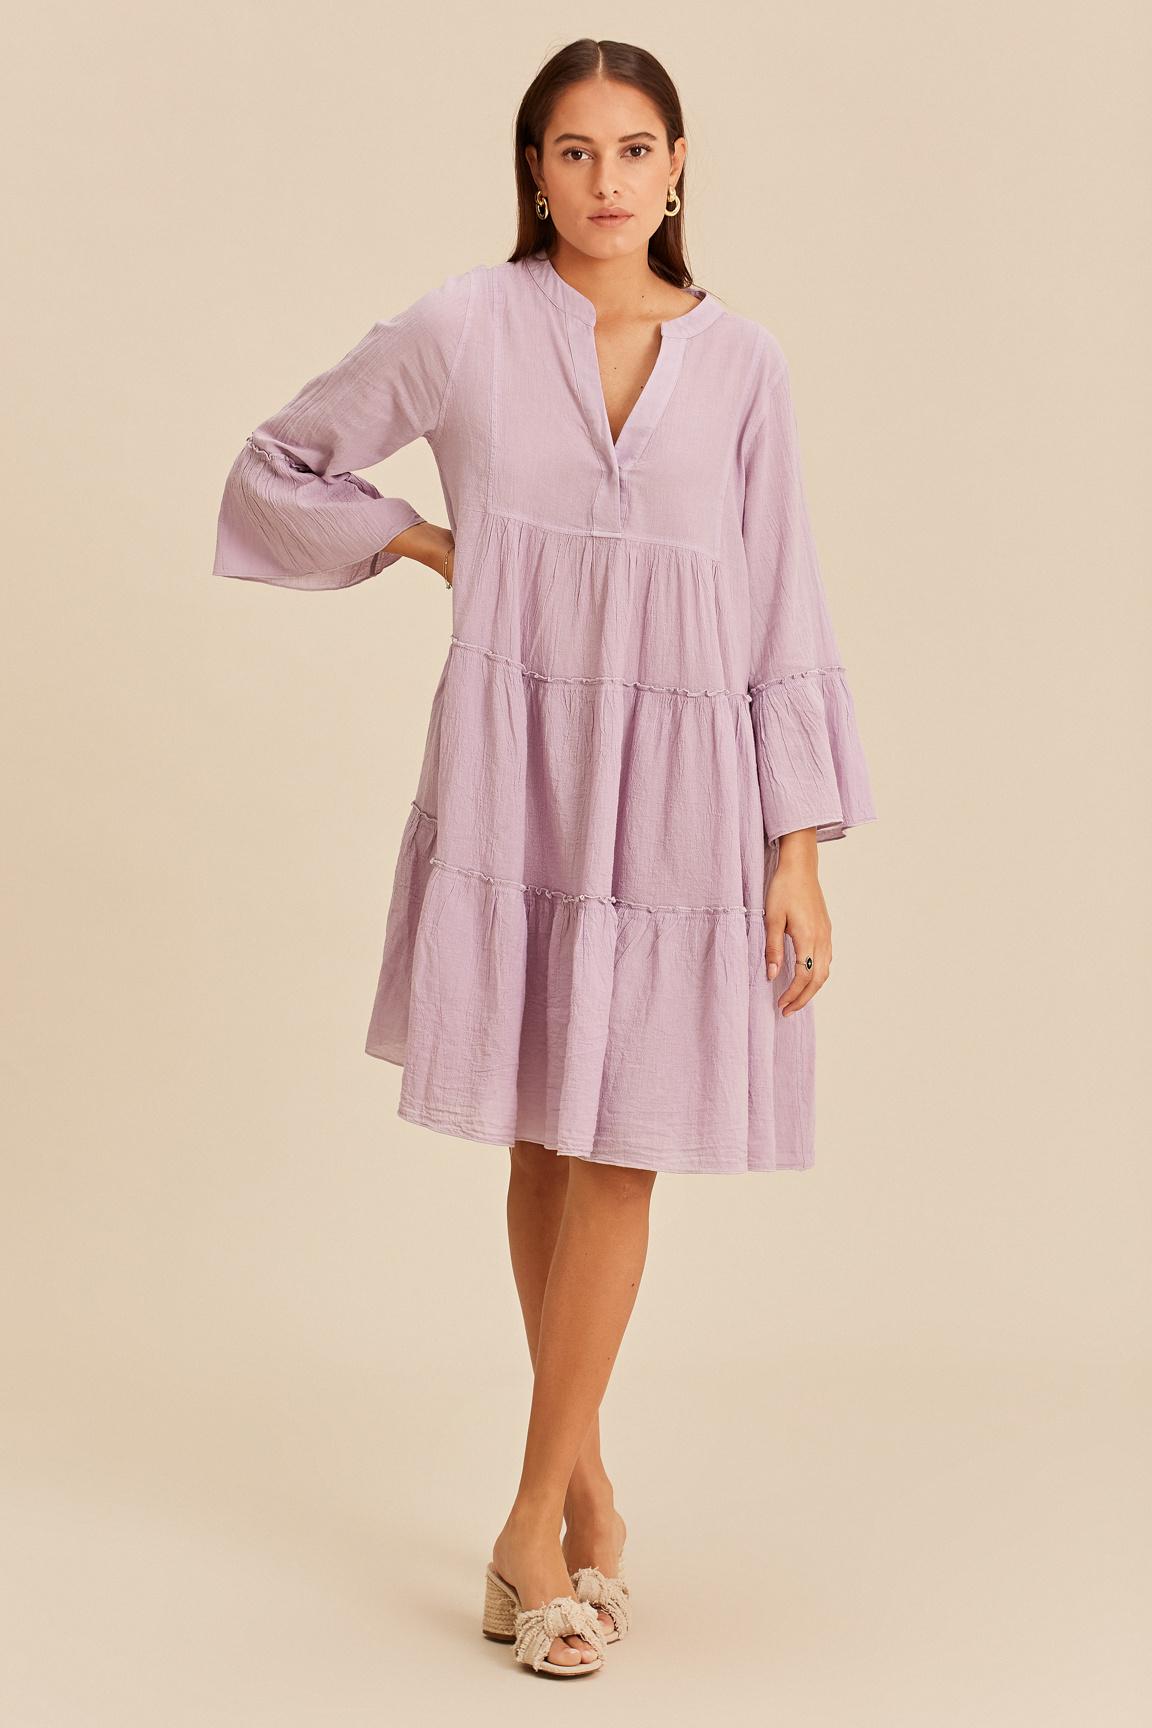 Dress Midi - Khaki-2